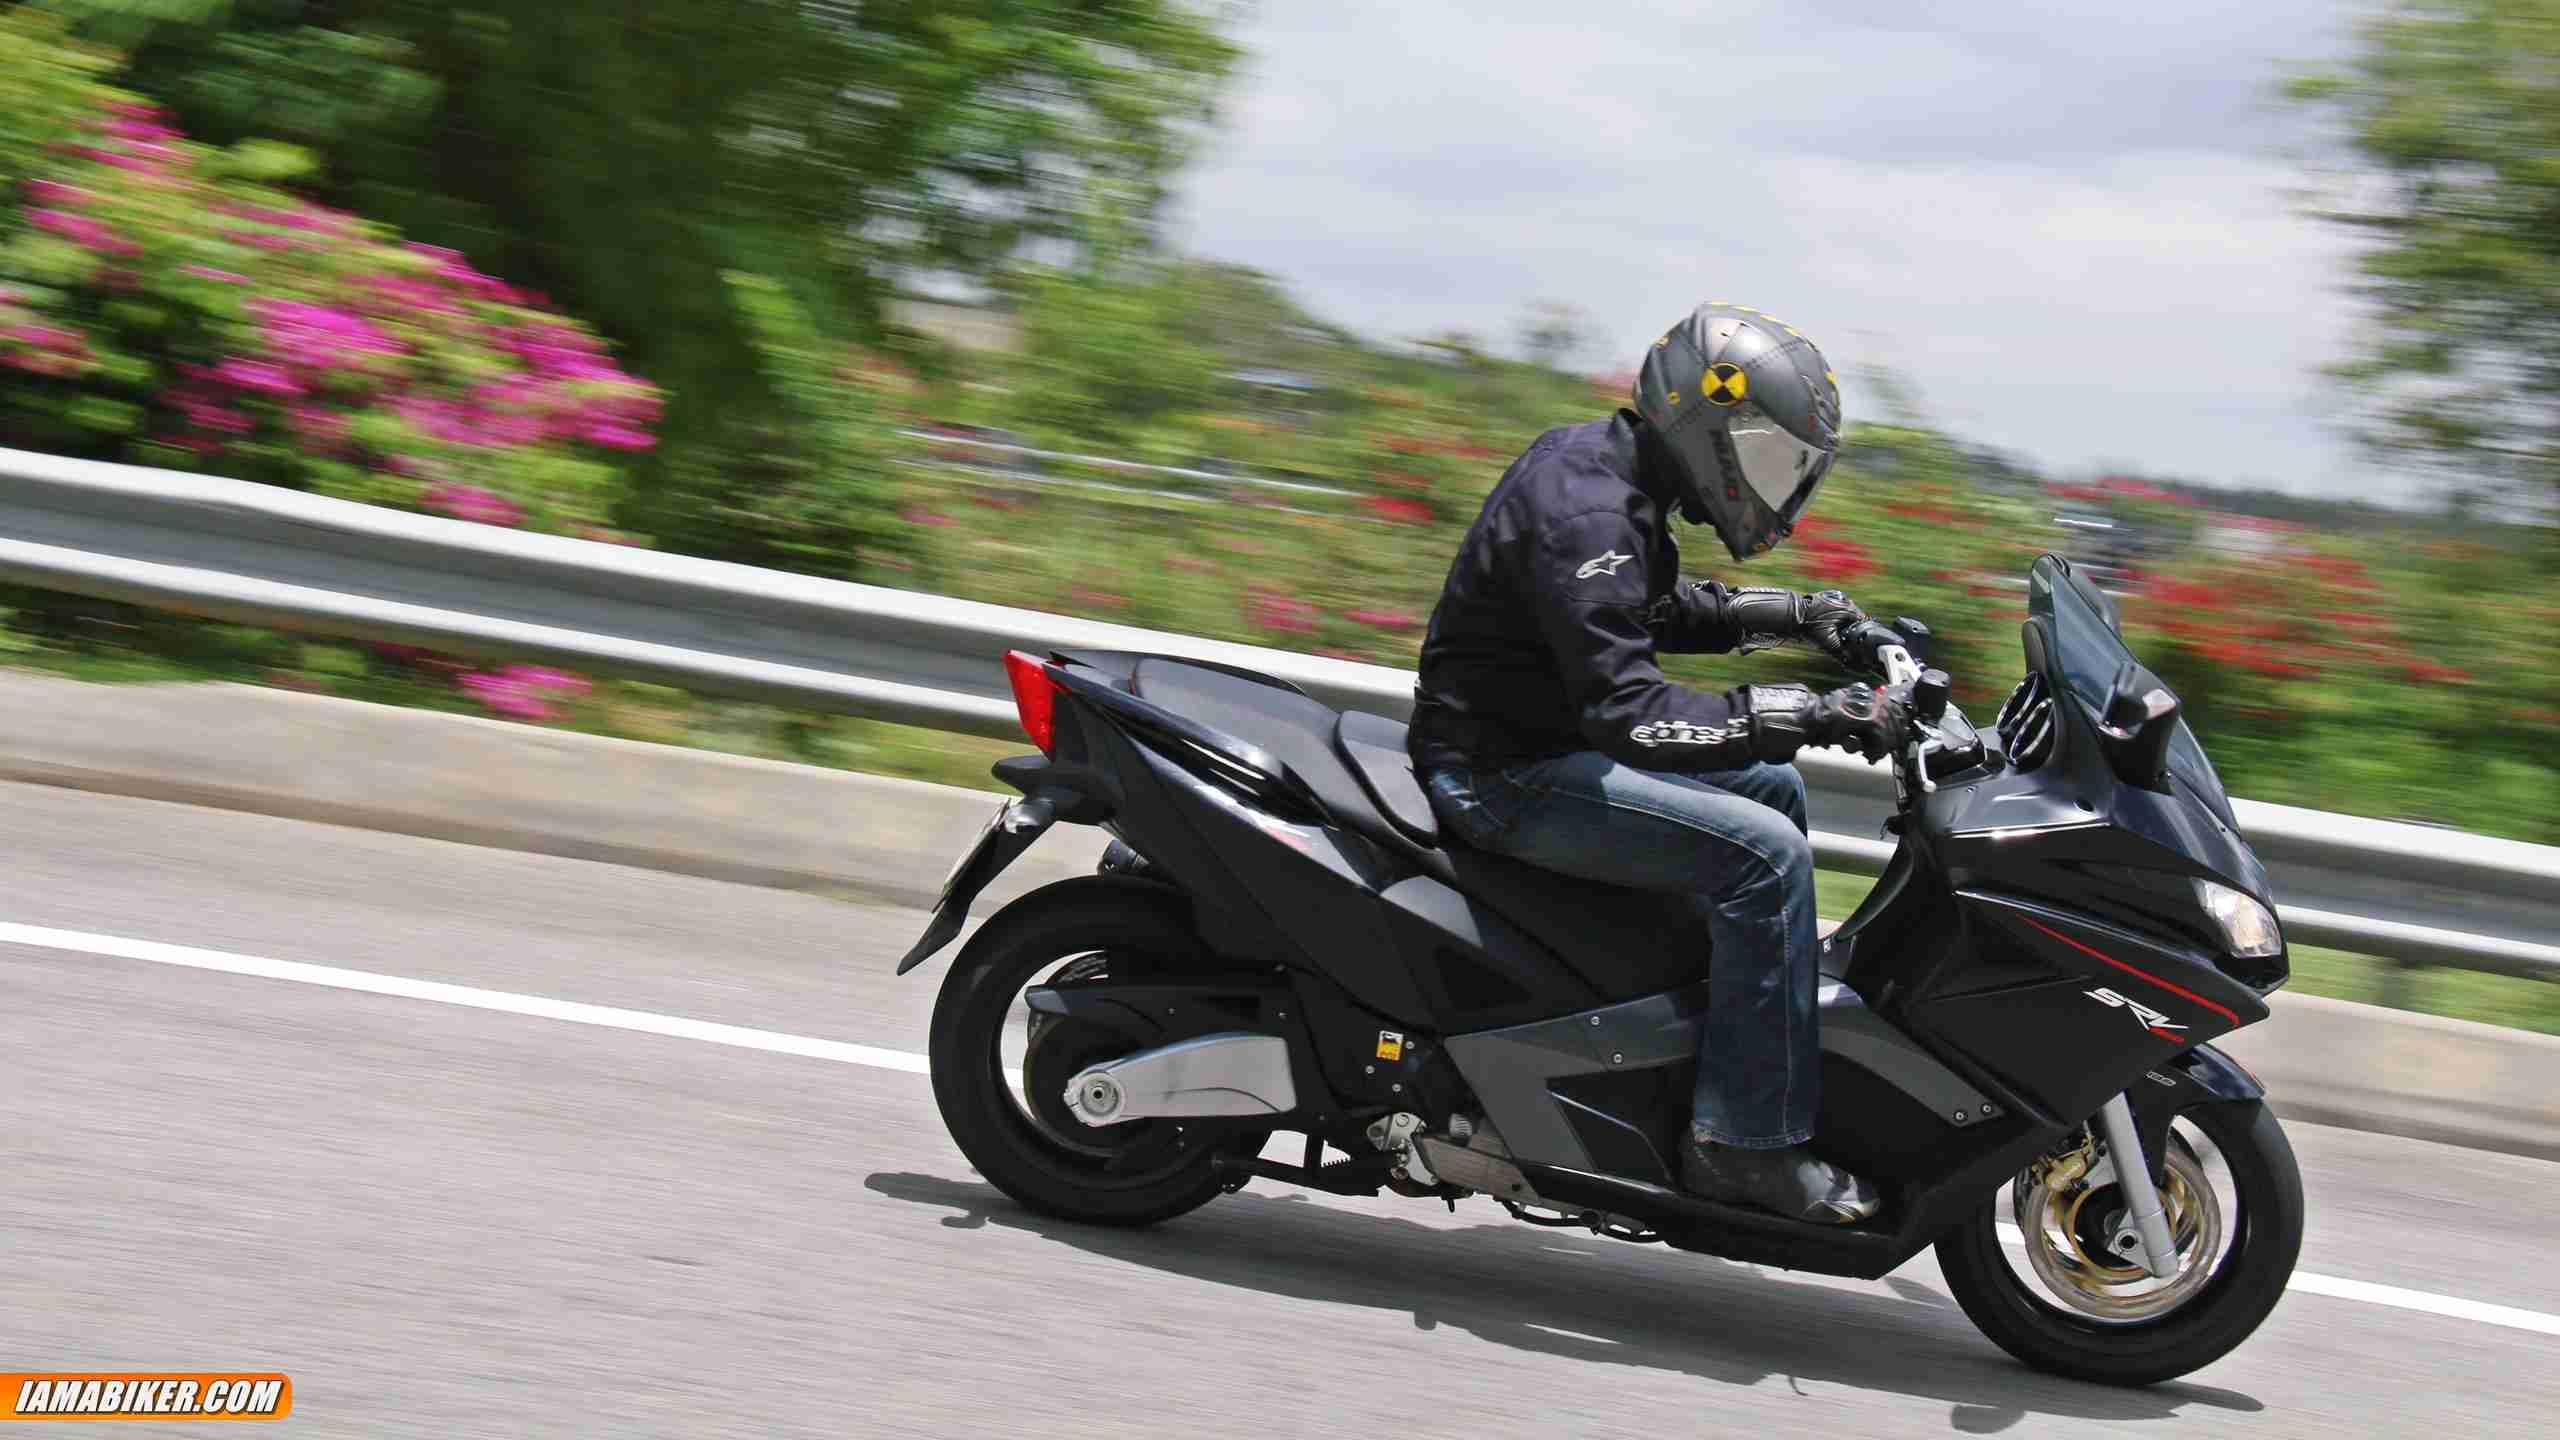 aprilia srv 850 review engine and performance